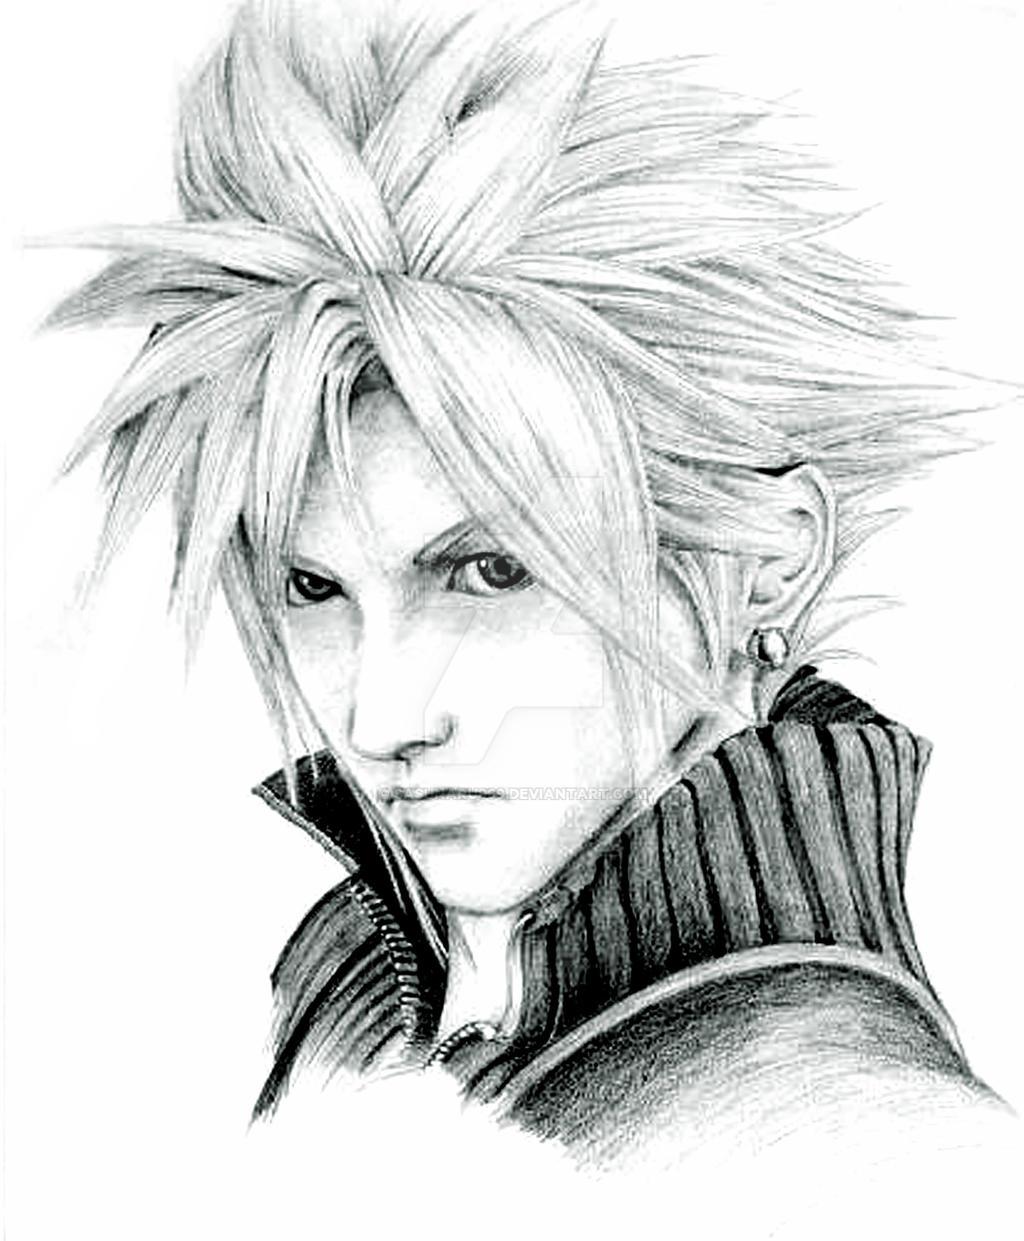 Final Fantasy Cloud Strife Wallpaper: Cloud Strife Final Fantasy VII By Sasunaru069 On DeviantArt